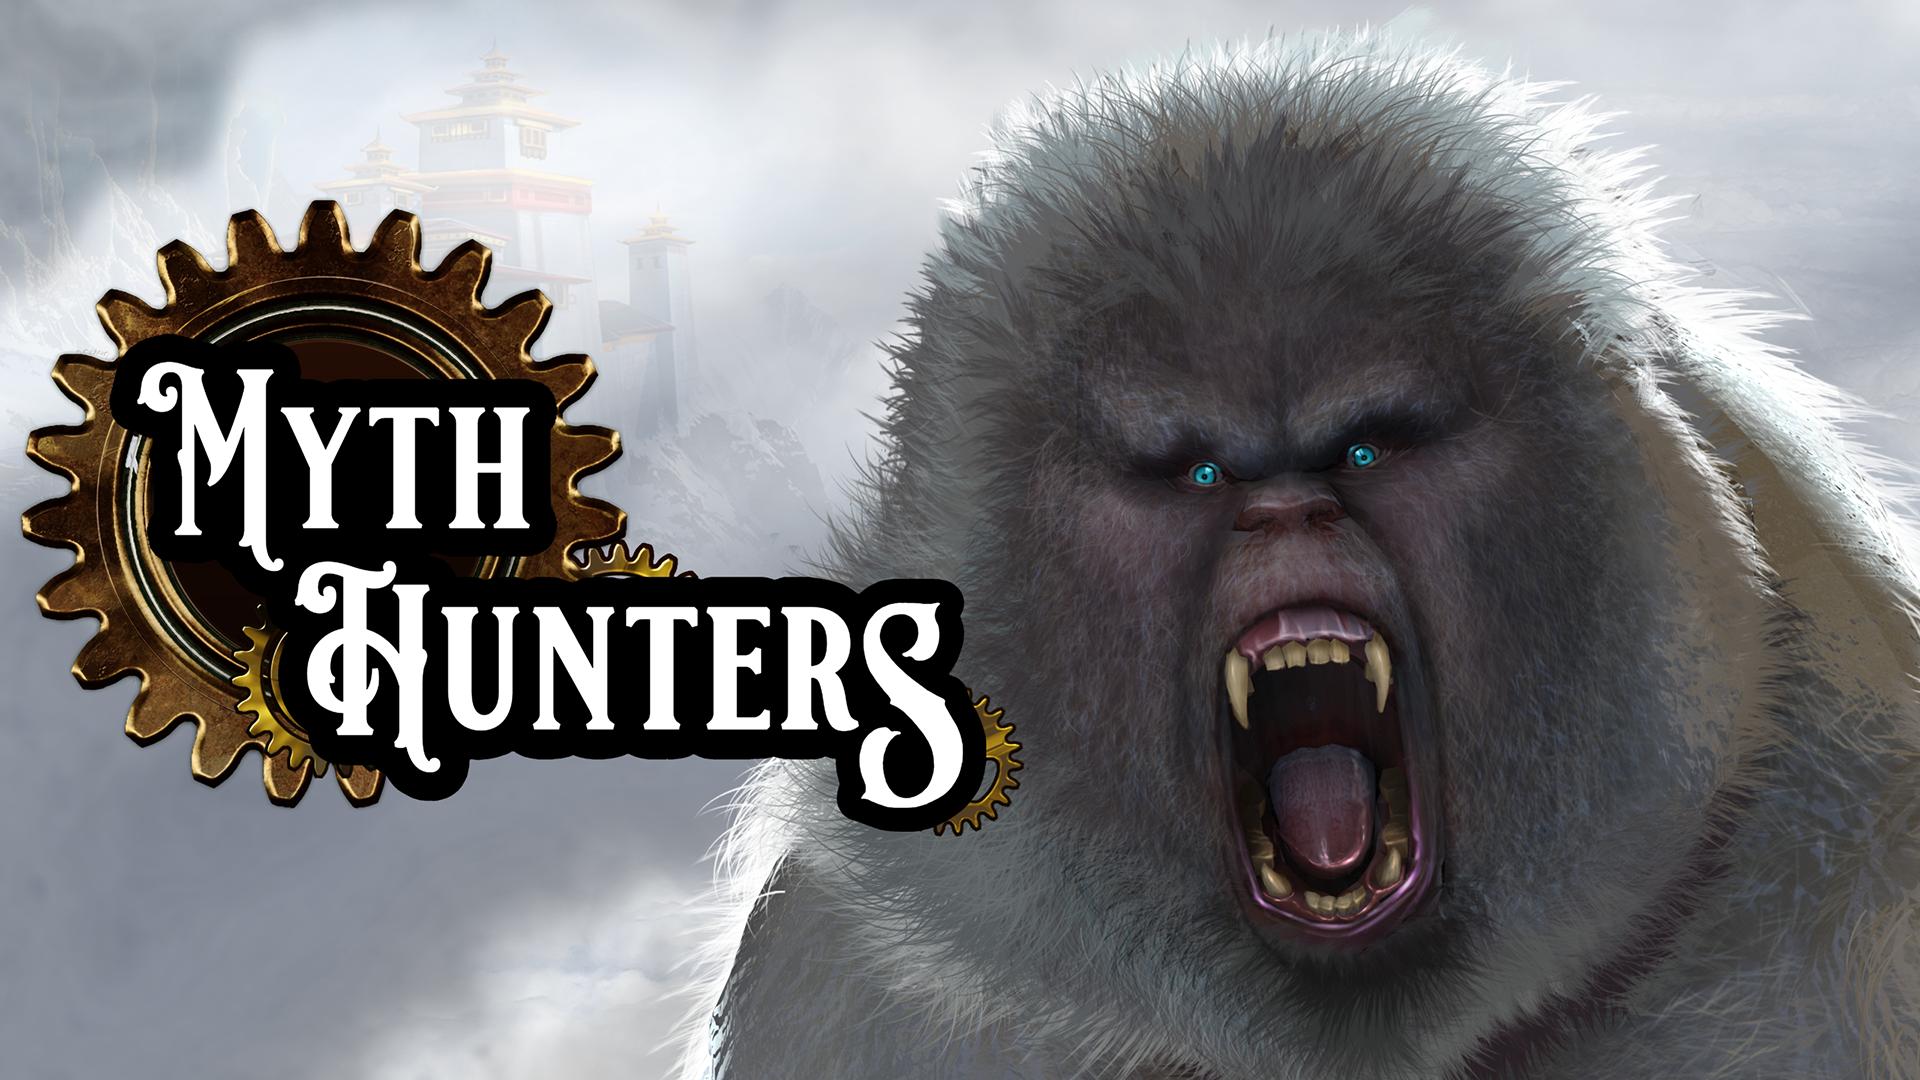 Myth_Hunters_Cover_Art.png